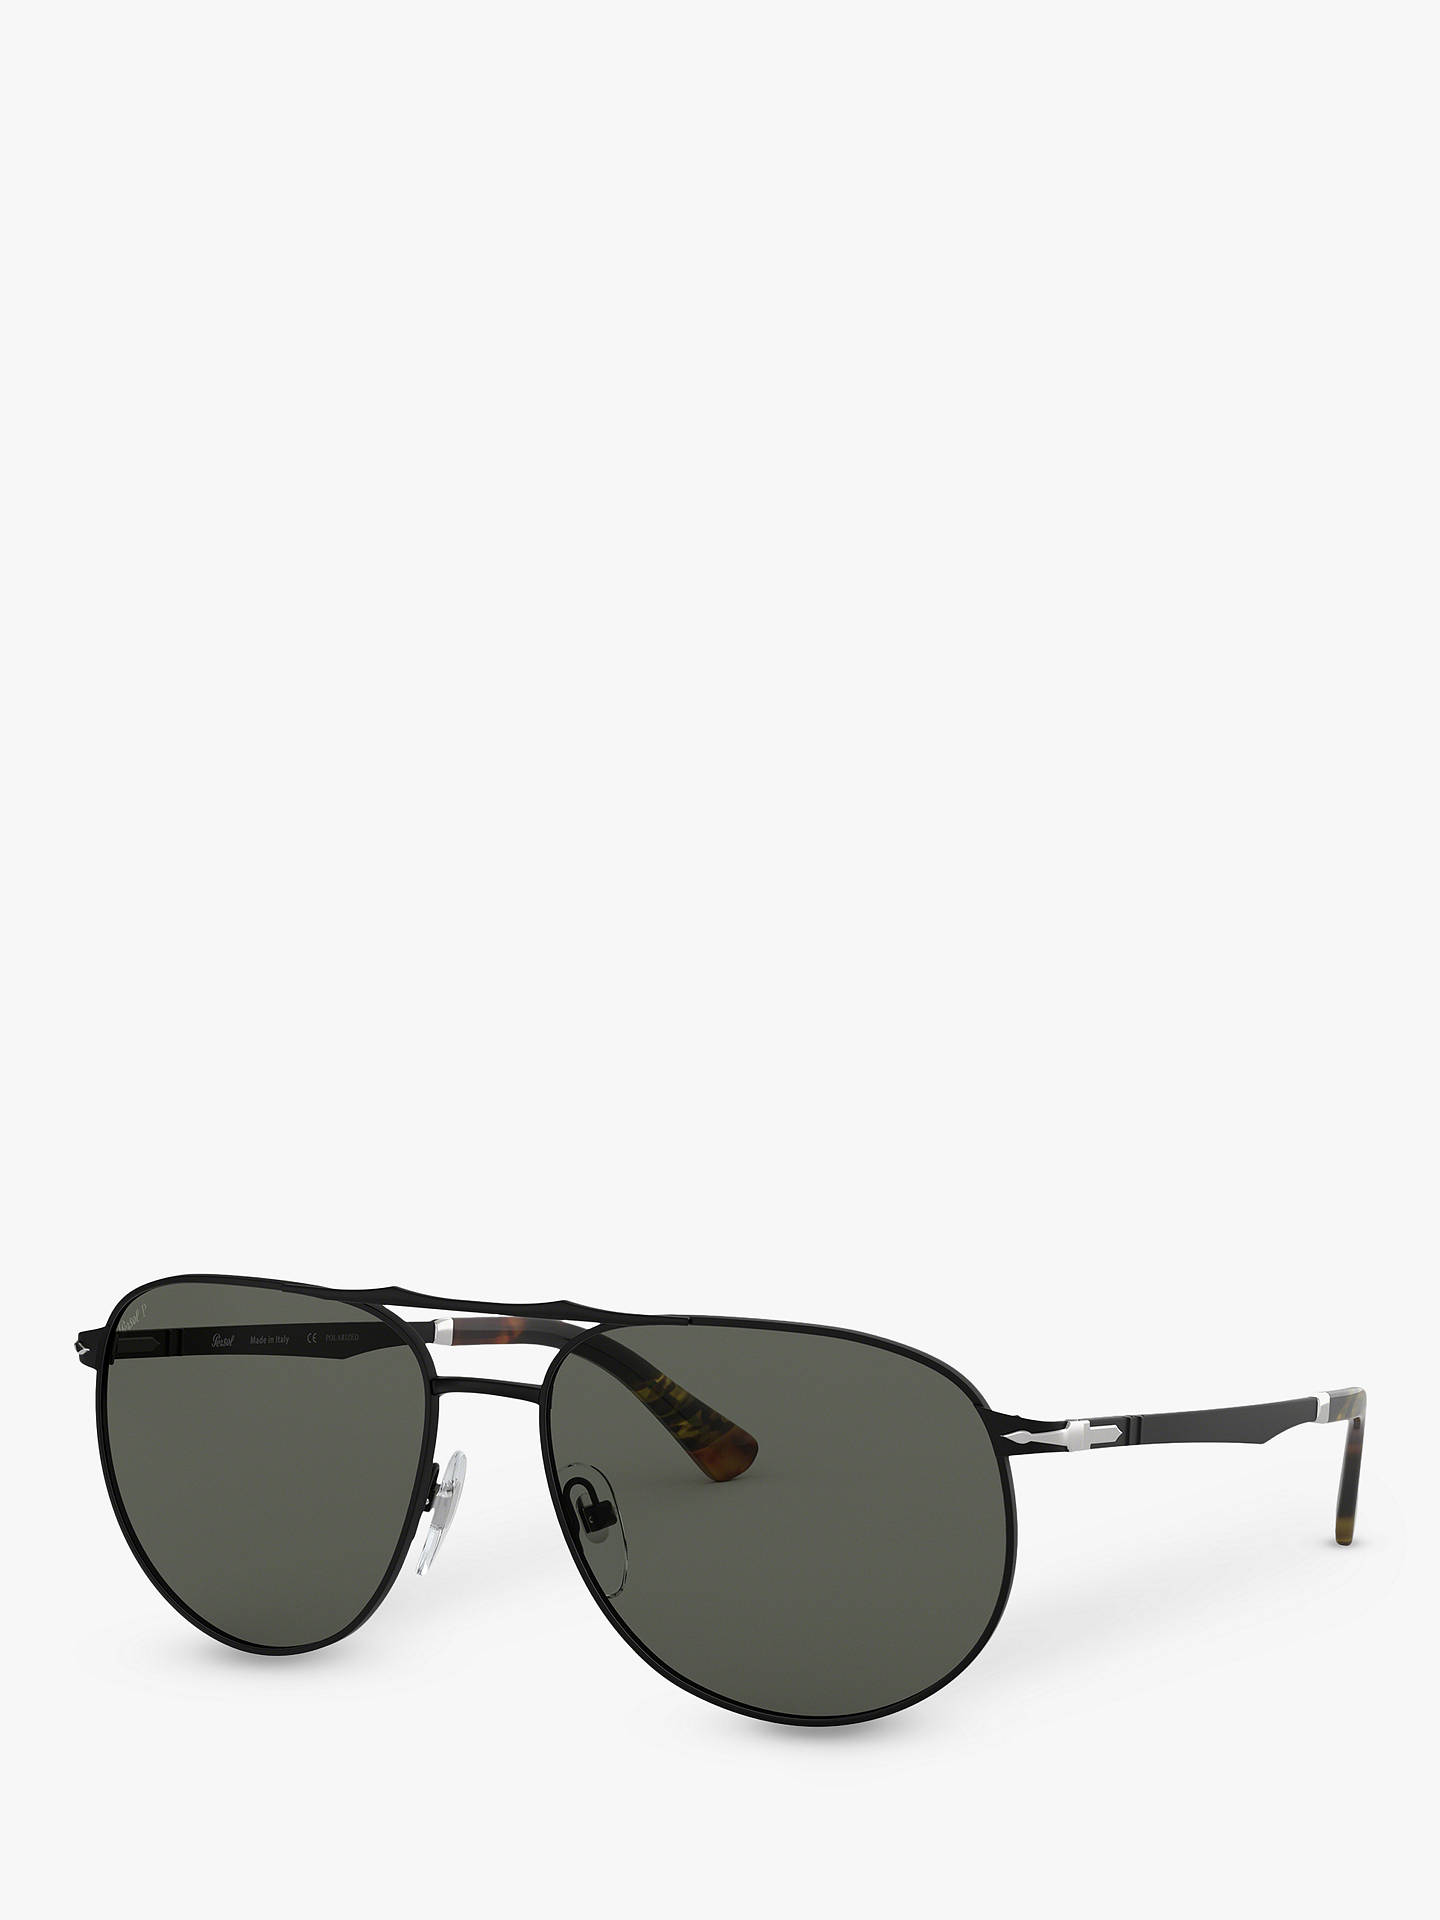 bcd1841fca Buy Persol PO2455S Men s Polarised Oval Sunglasses